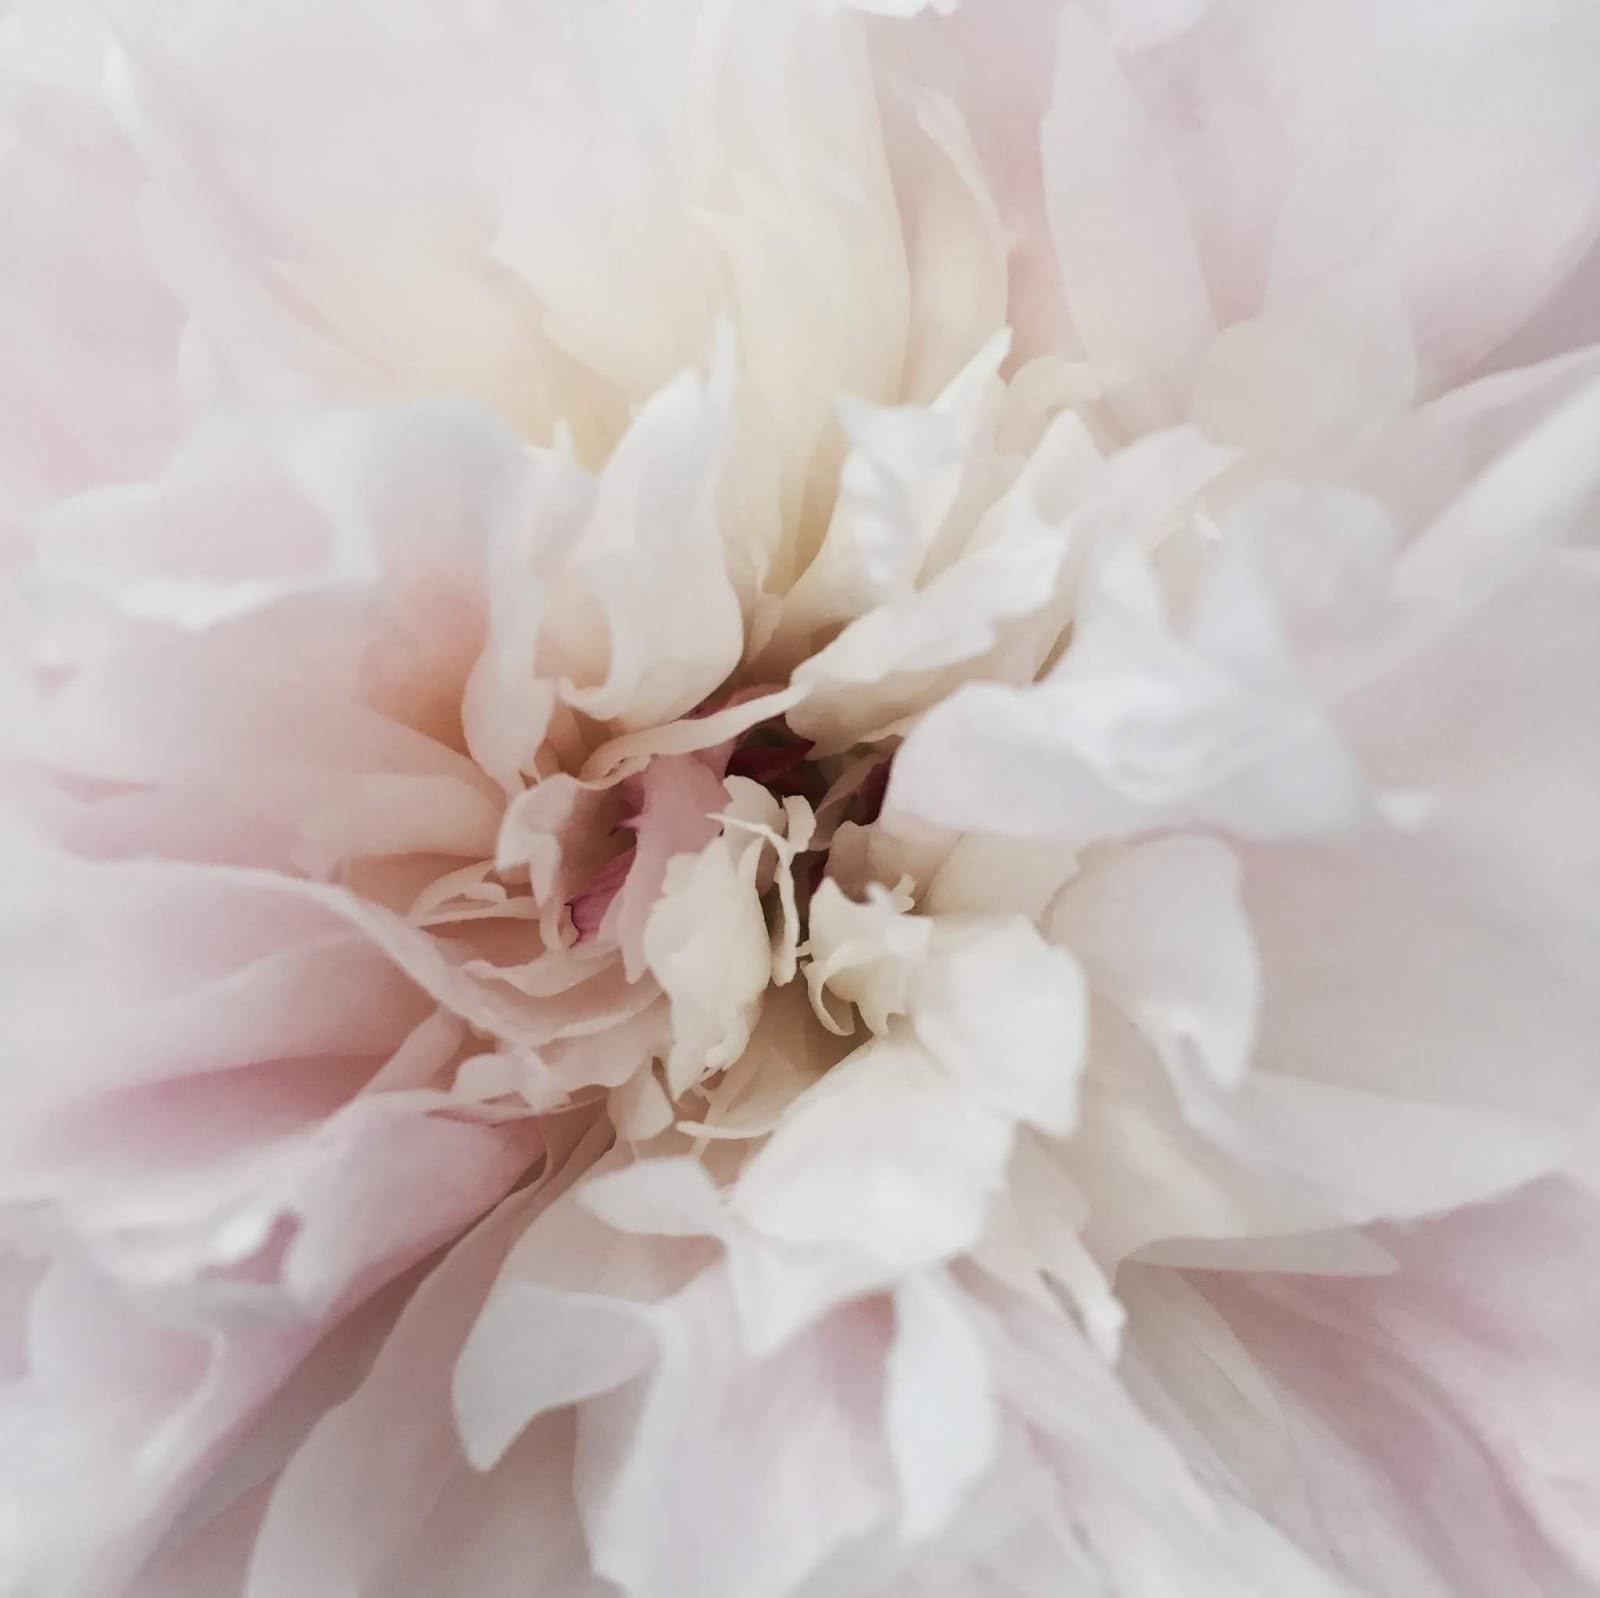 Elegant Blush Pink Peony Floral Photography Closeup Image